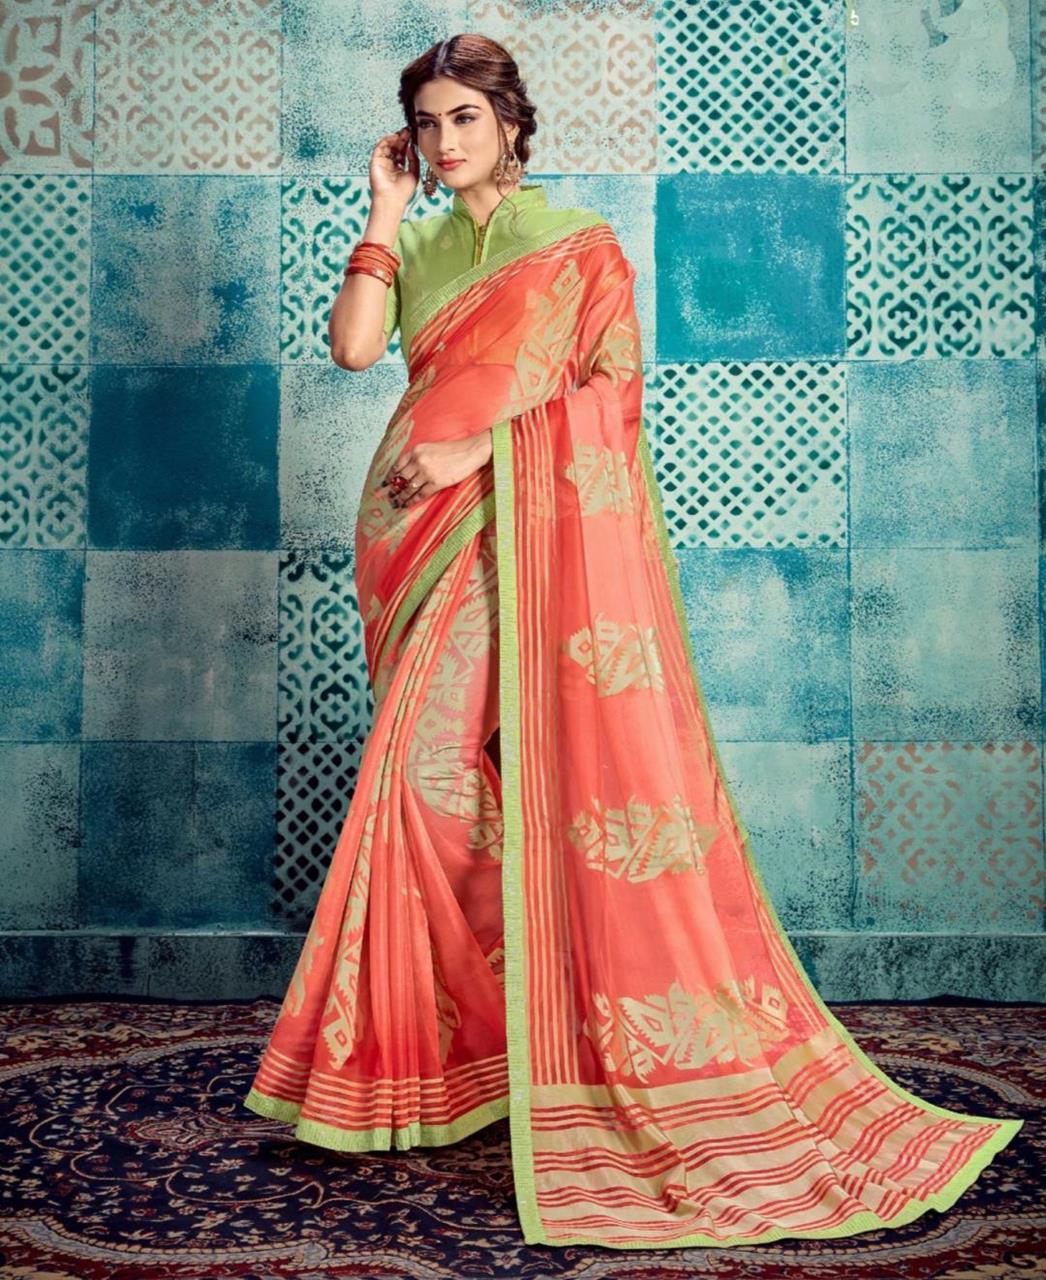 Printed Silk Saree in Peach